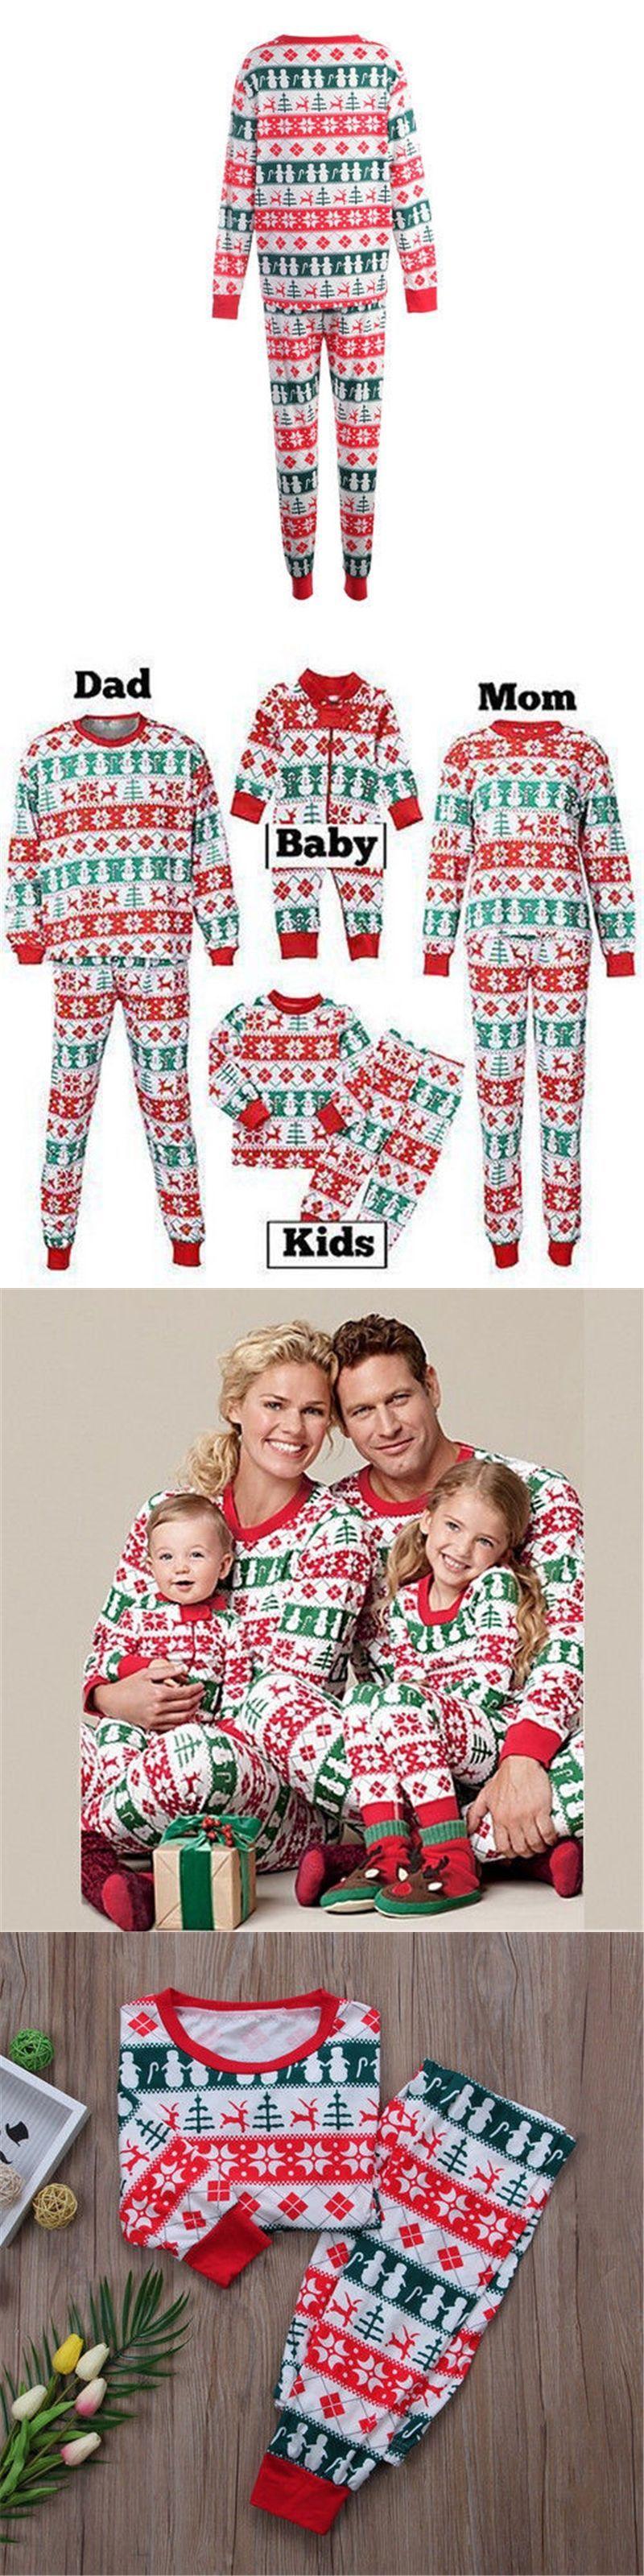 Family Matching Christmas Pajamas Set 2017 New Bebes Xmas Women Men Baby  Kids Sleepwear Nightwear Cute 7b4830ea8